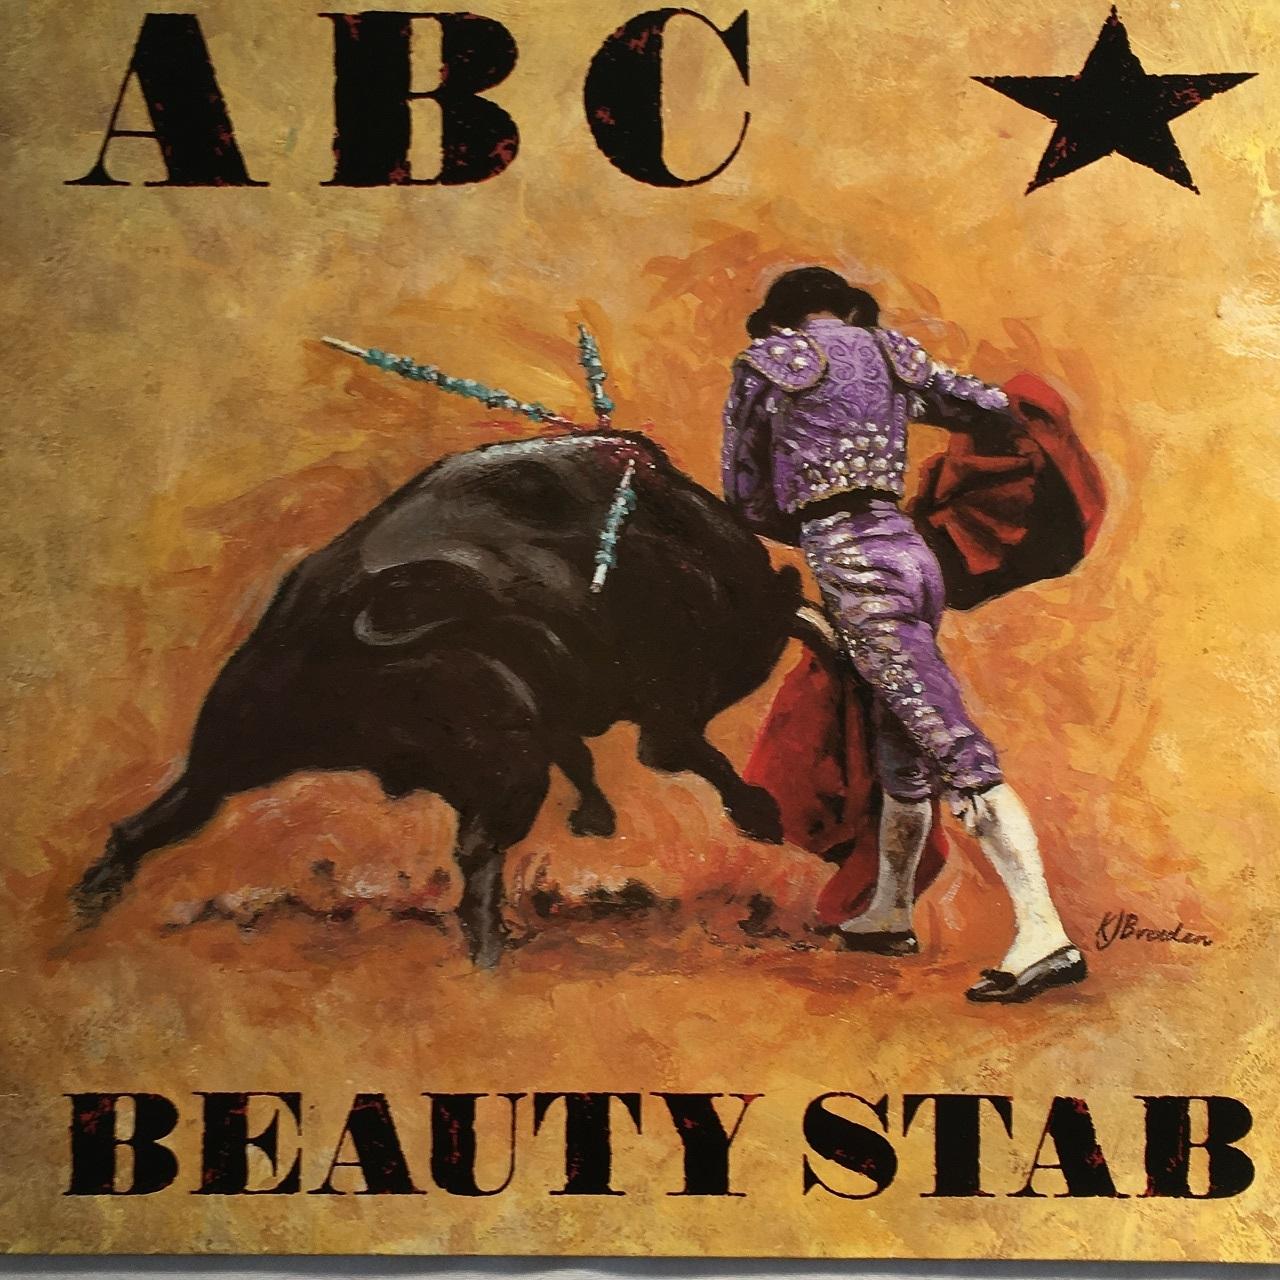 【LP・英盤】ABC / Beauty Stab